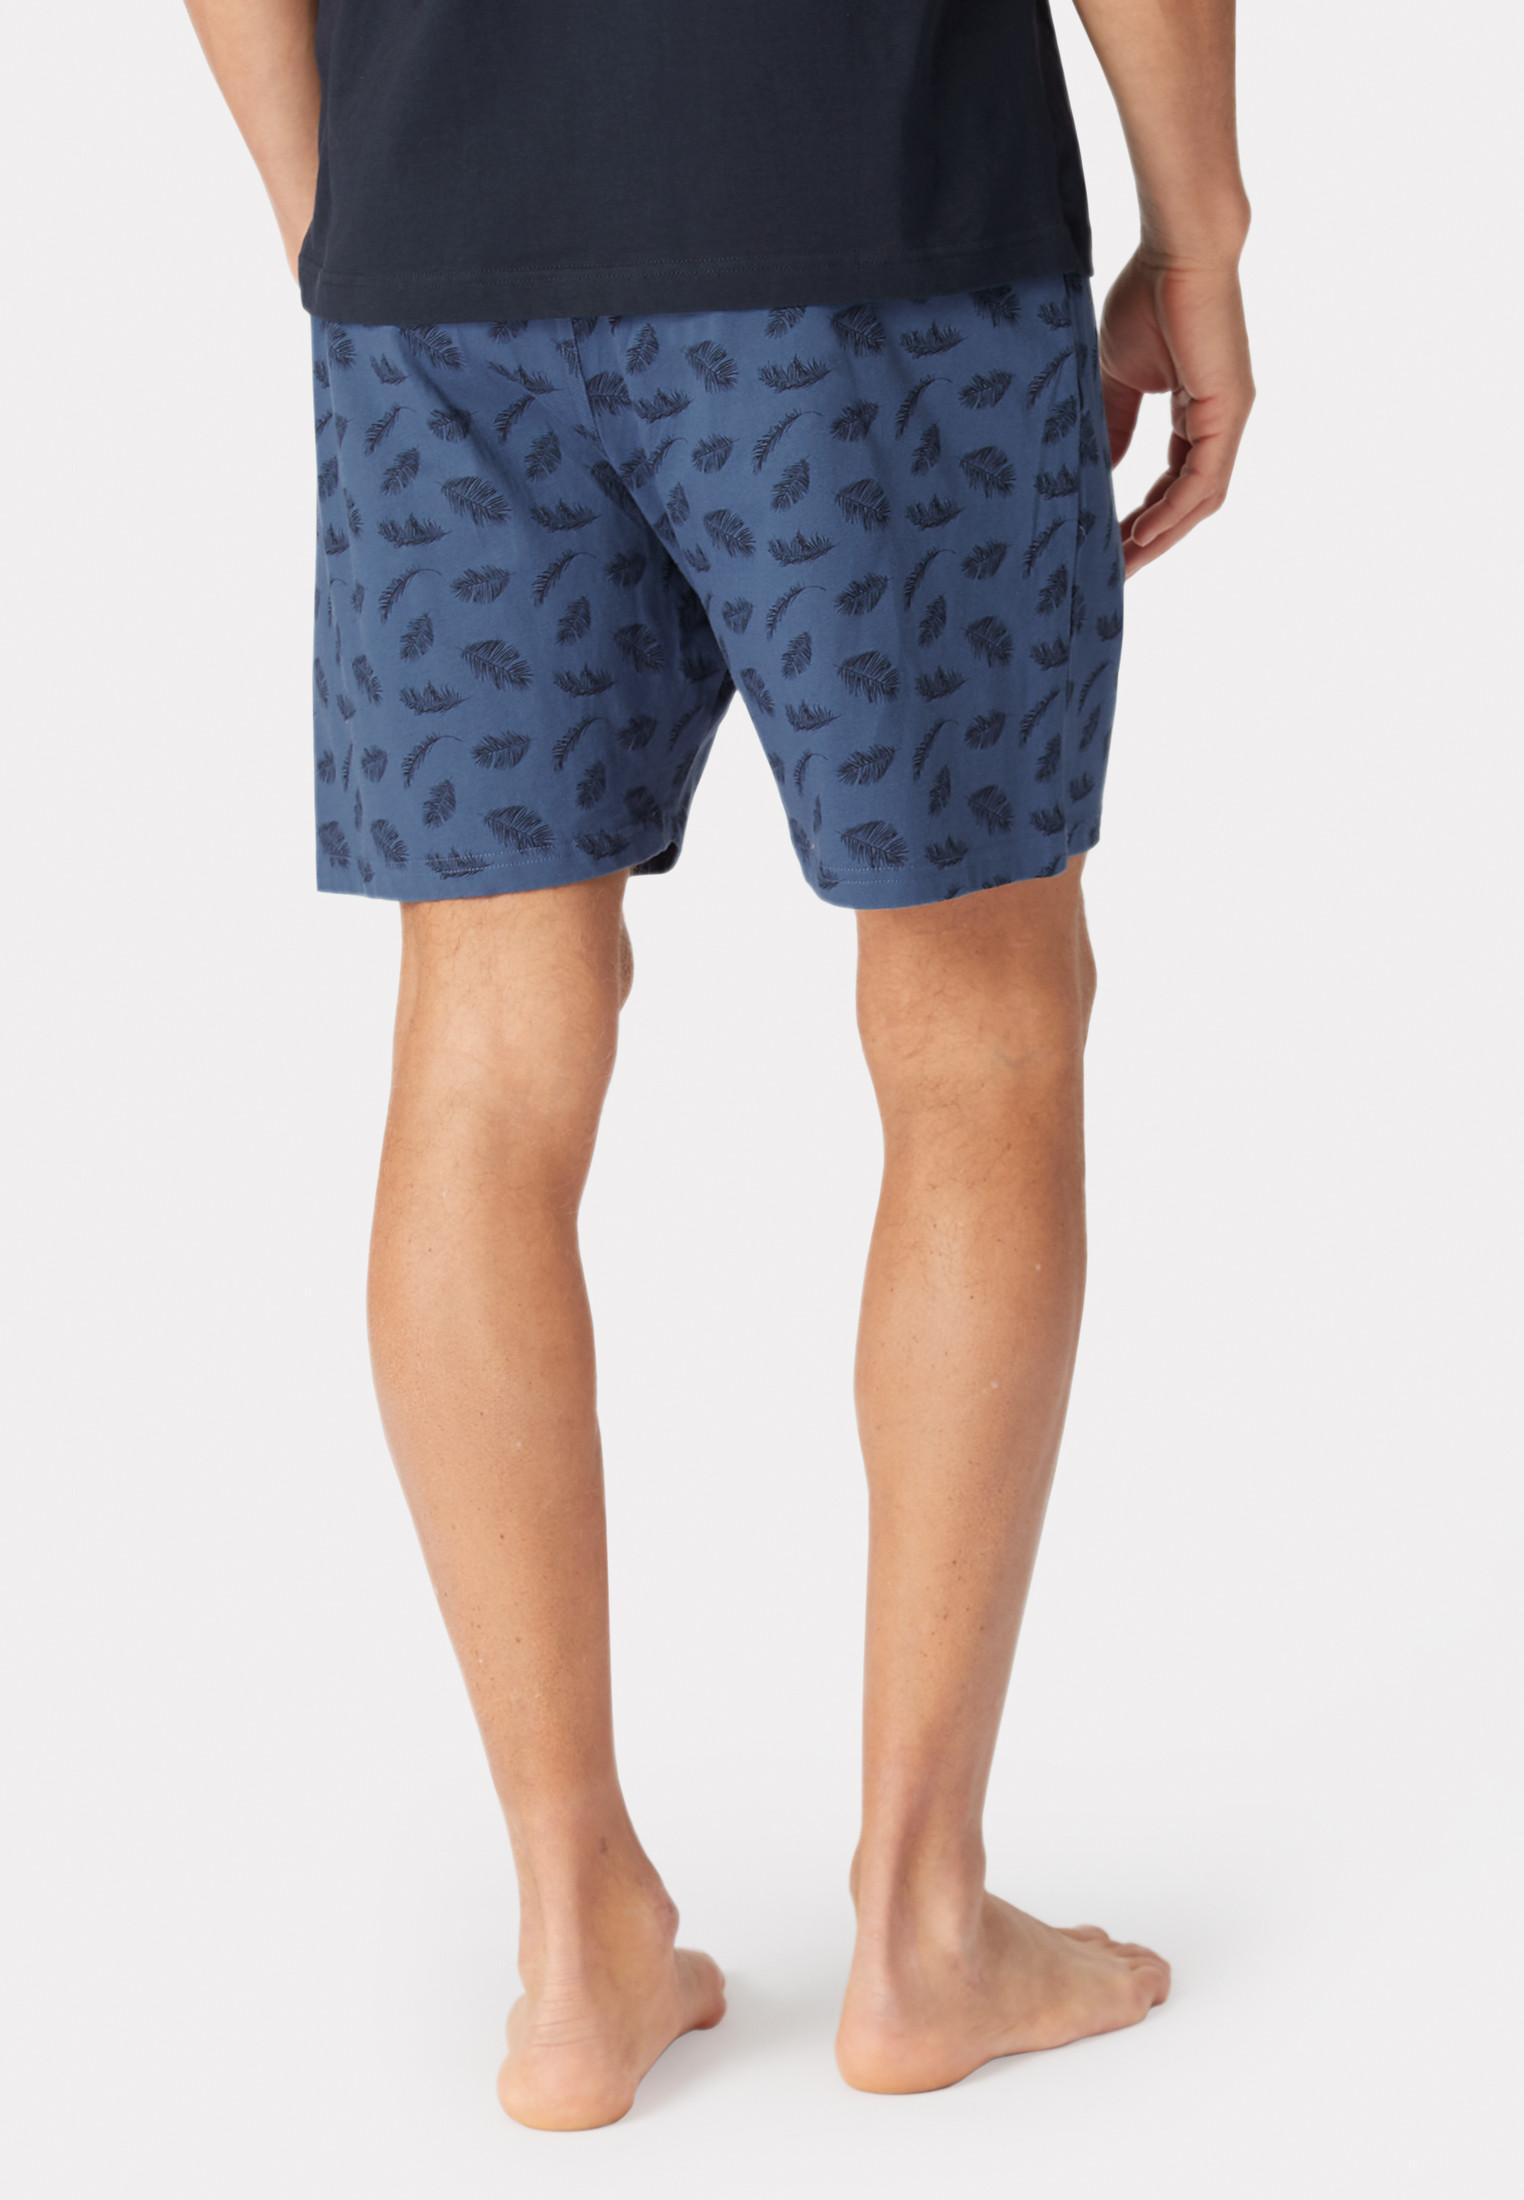 Masham Denim Blue with Feather Print Design Jersey Lounge Shorts